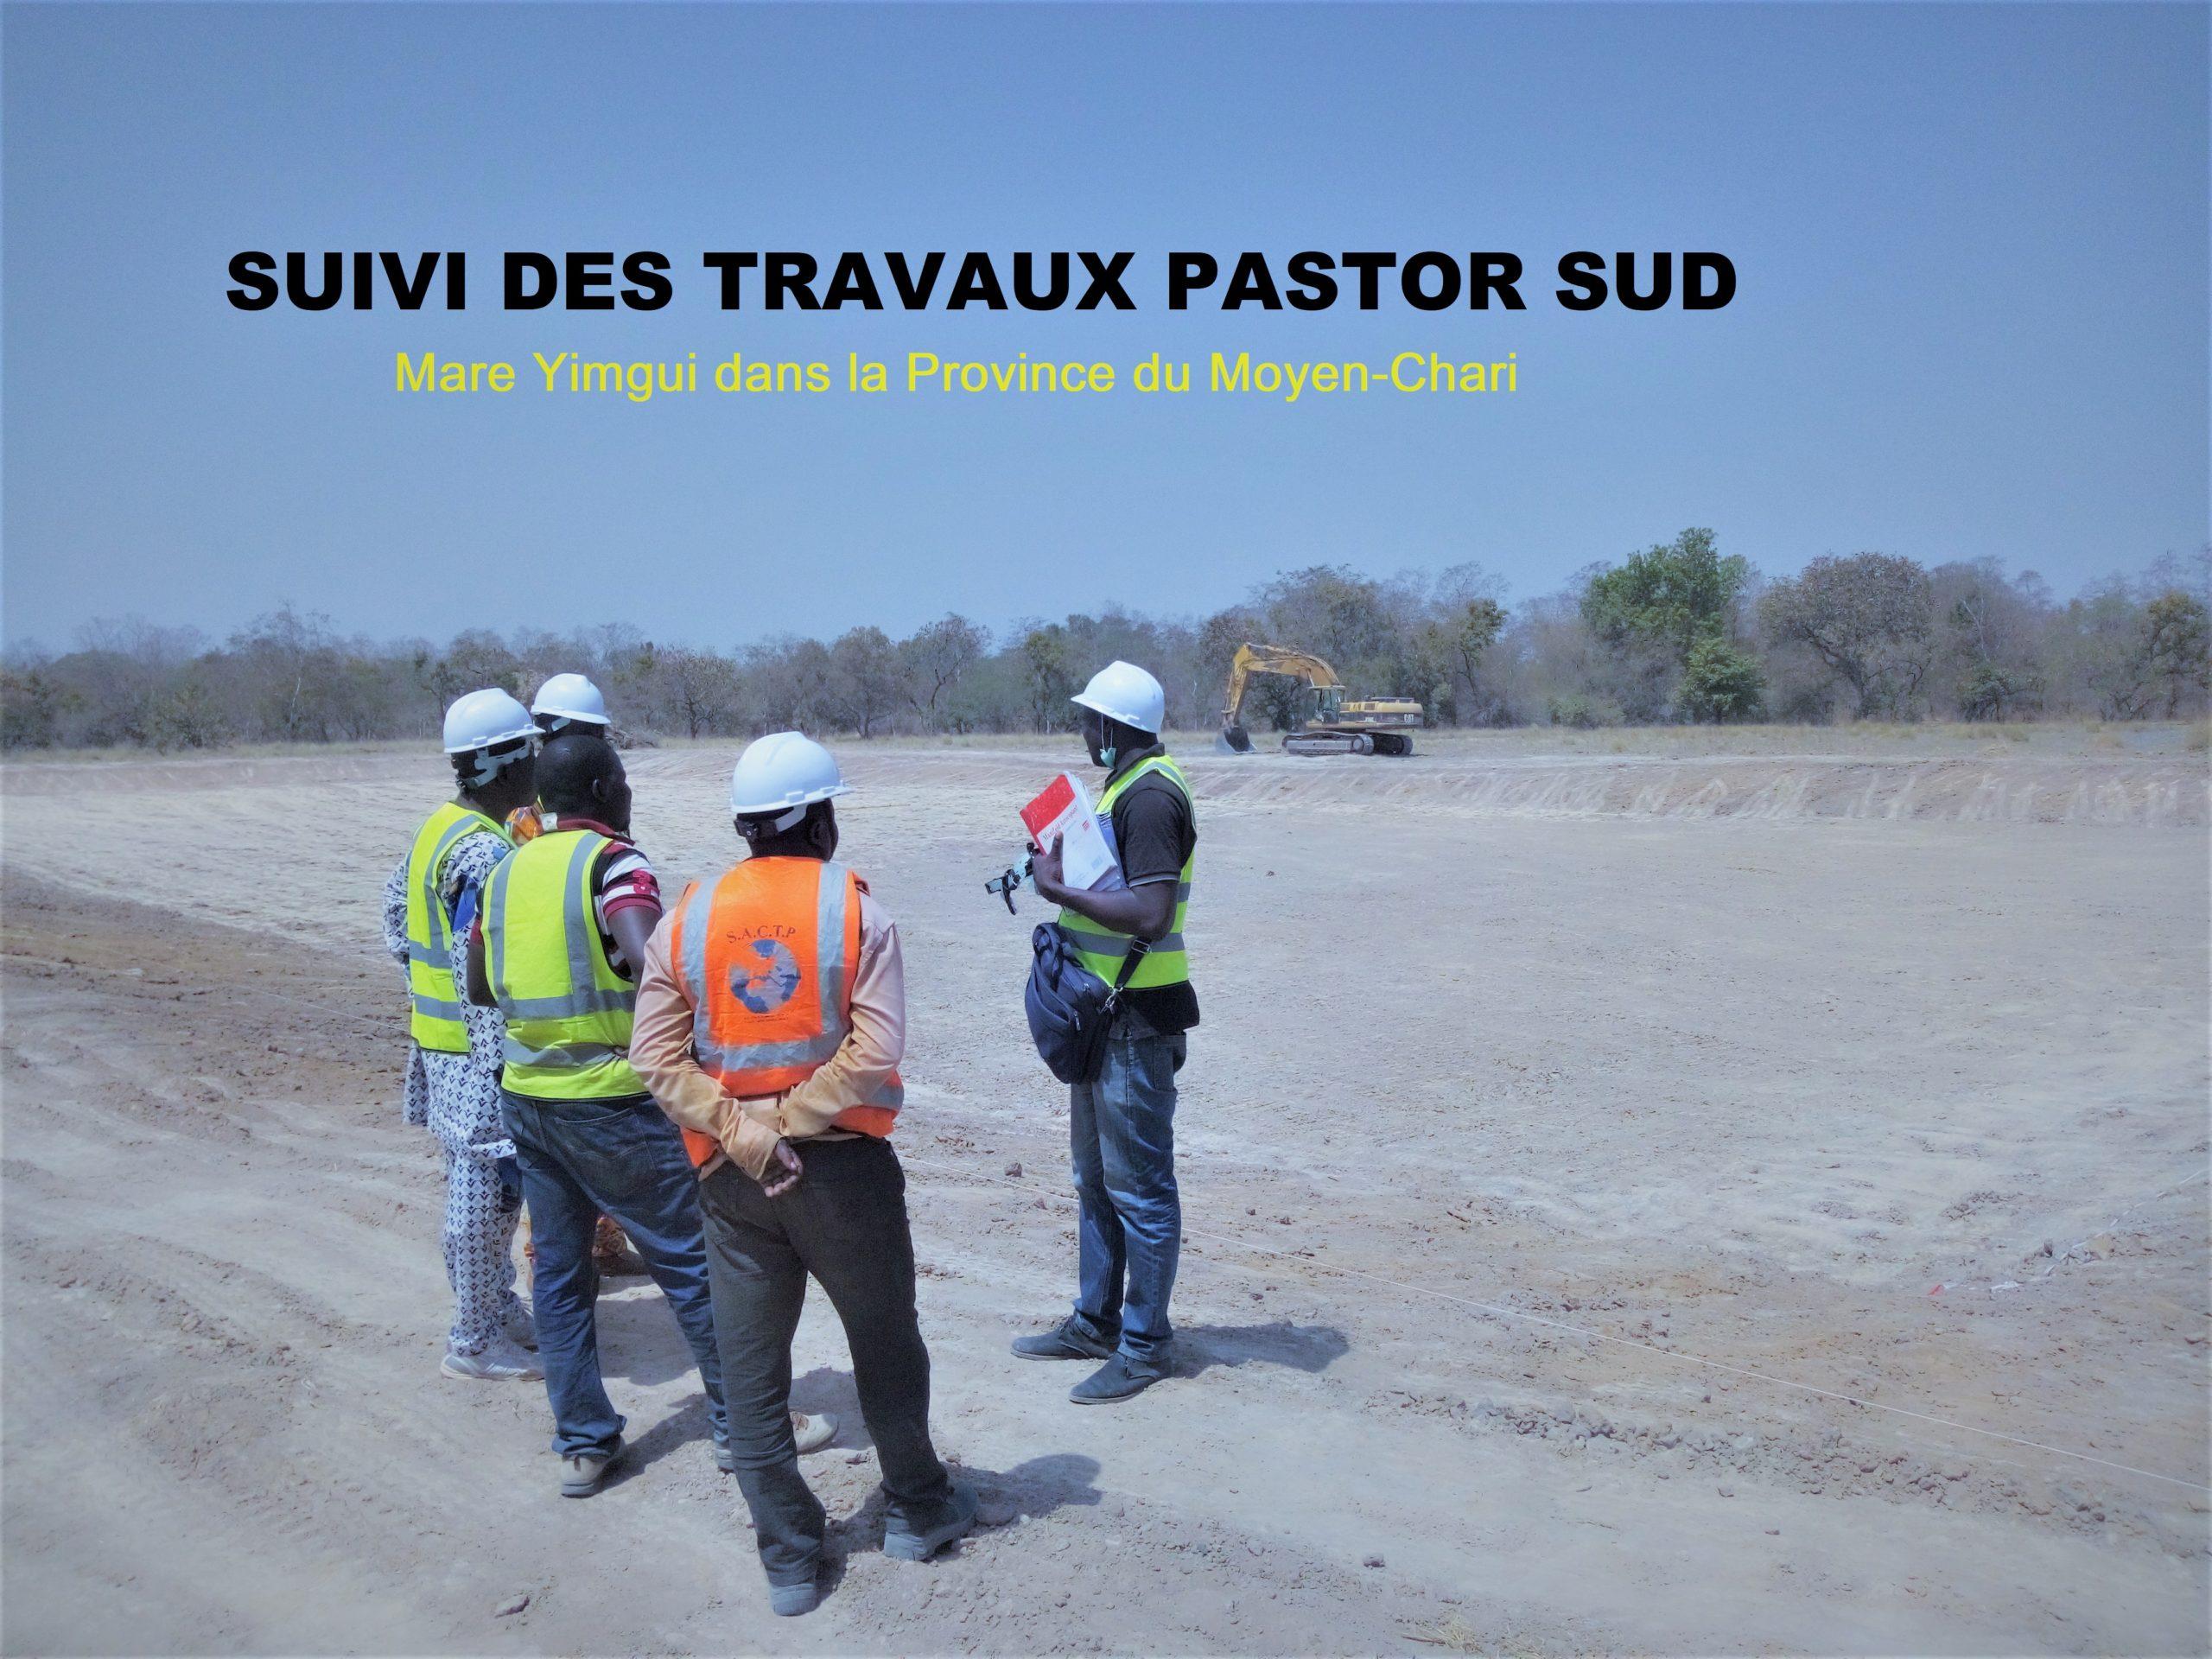 Photo@PastorSud